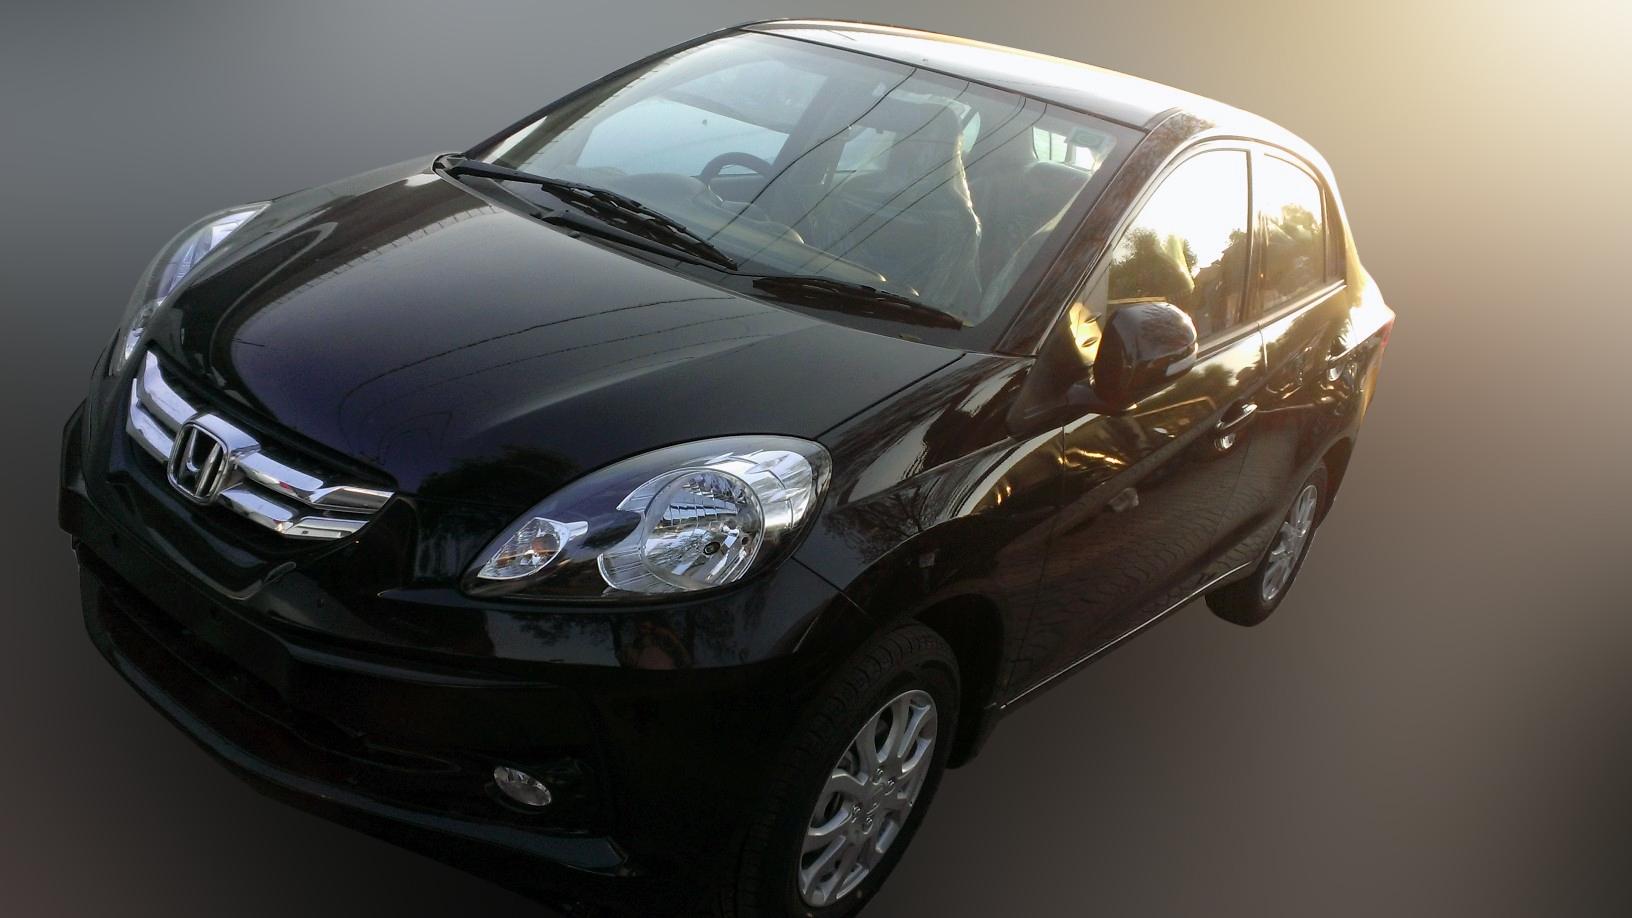 Honda Amaze Black Dealer Car Wallpapers Gallery Free